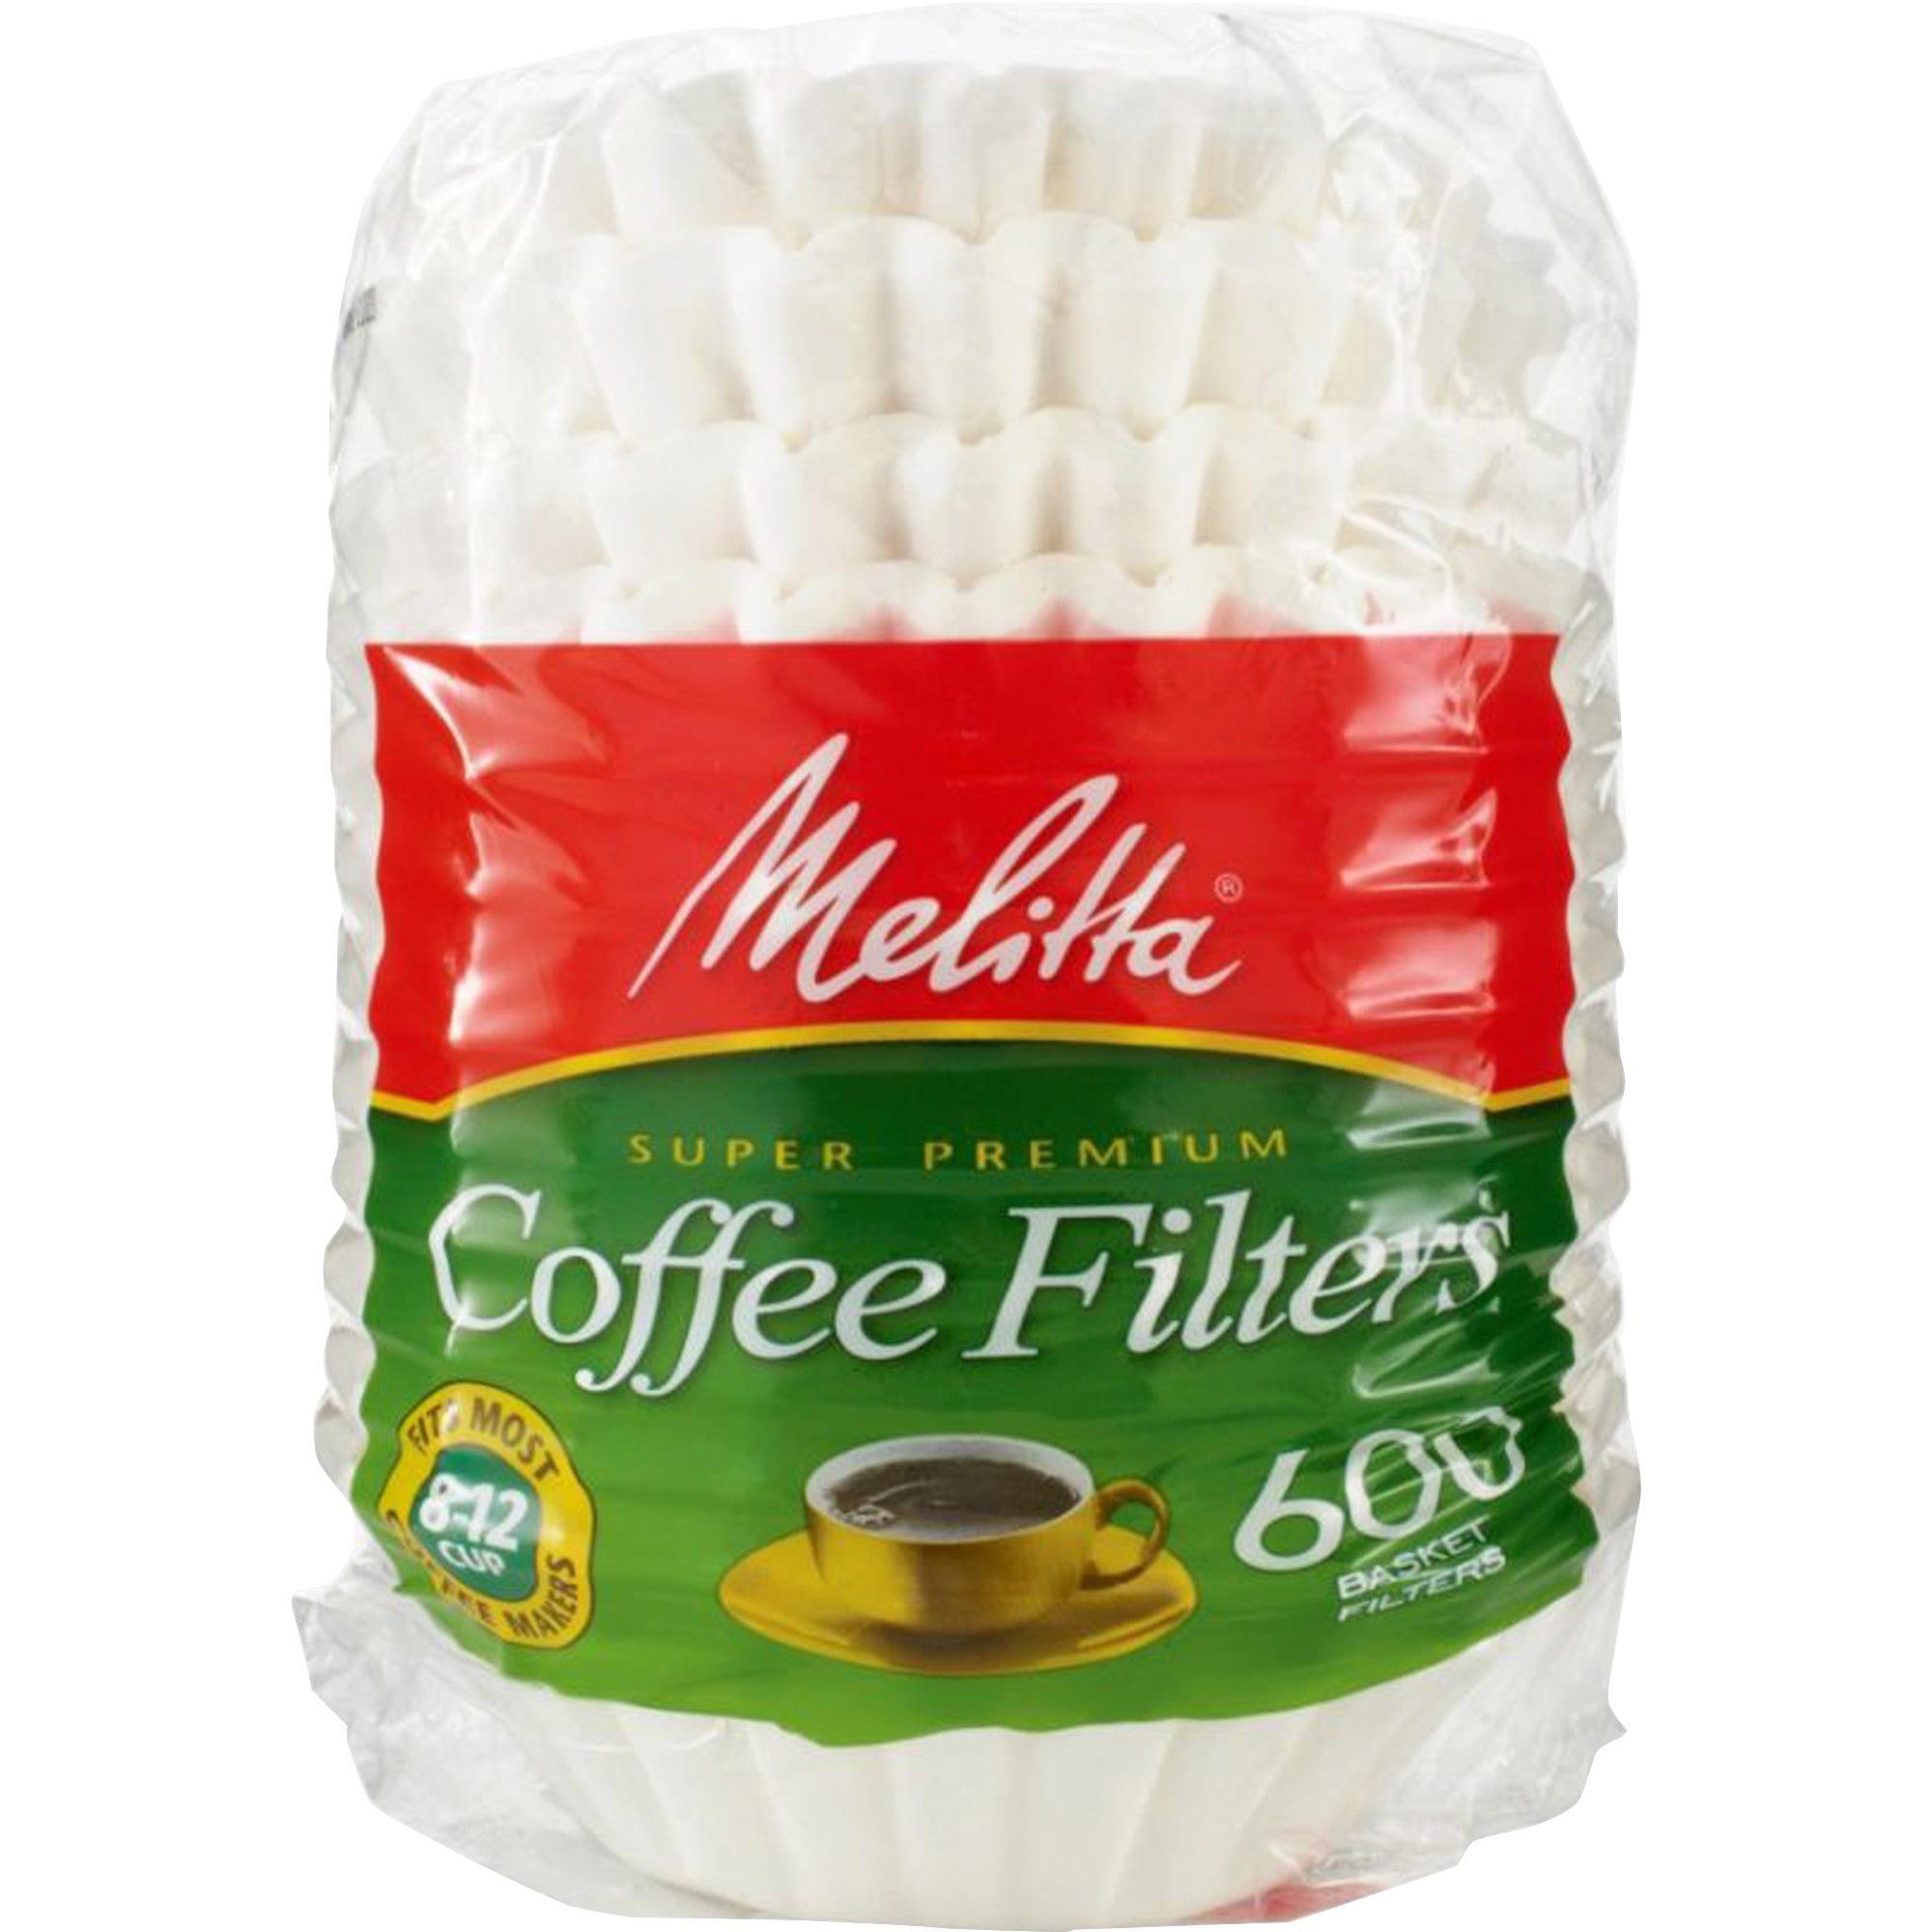 Melitta, MLA631132, Super Premium Basket-style Coffee Filter, 600 / Pack, White